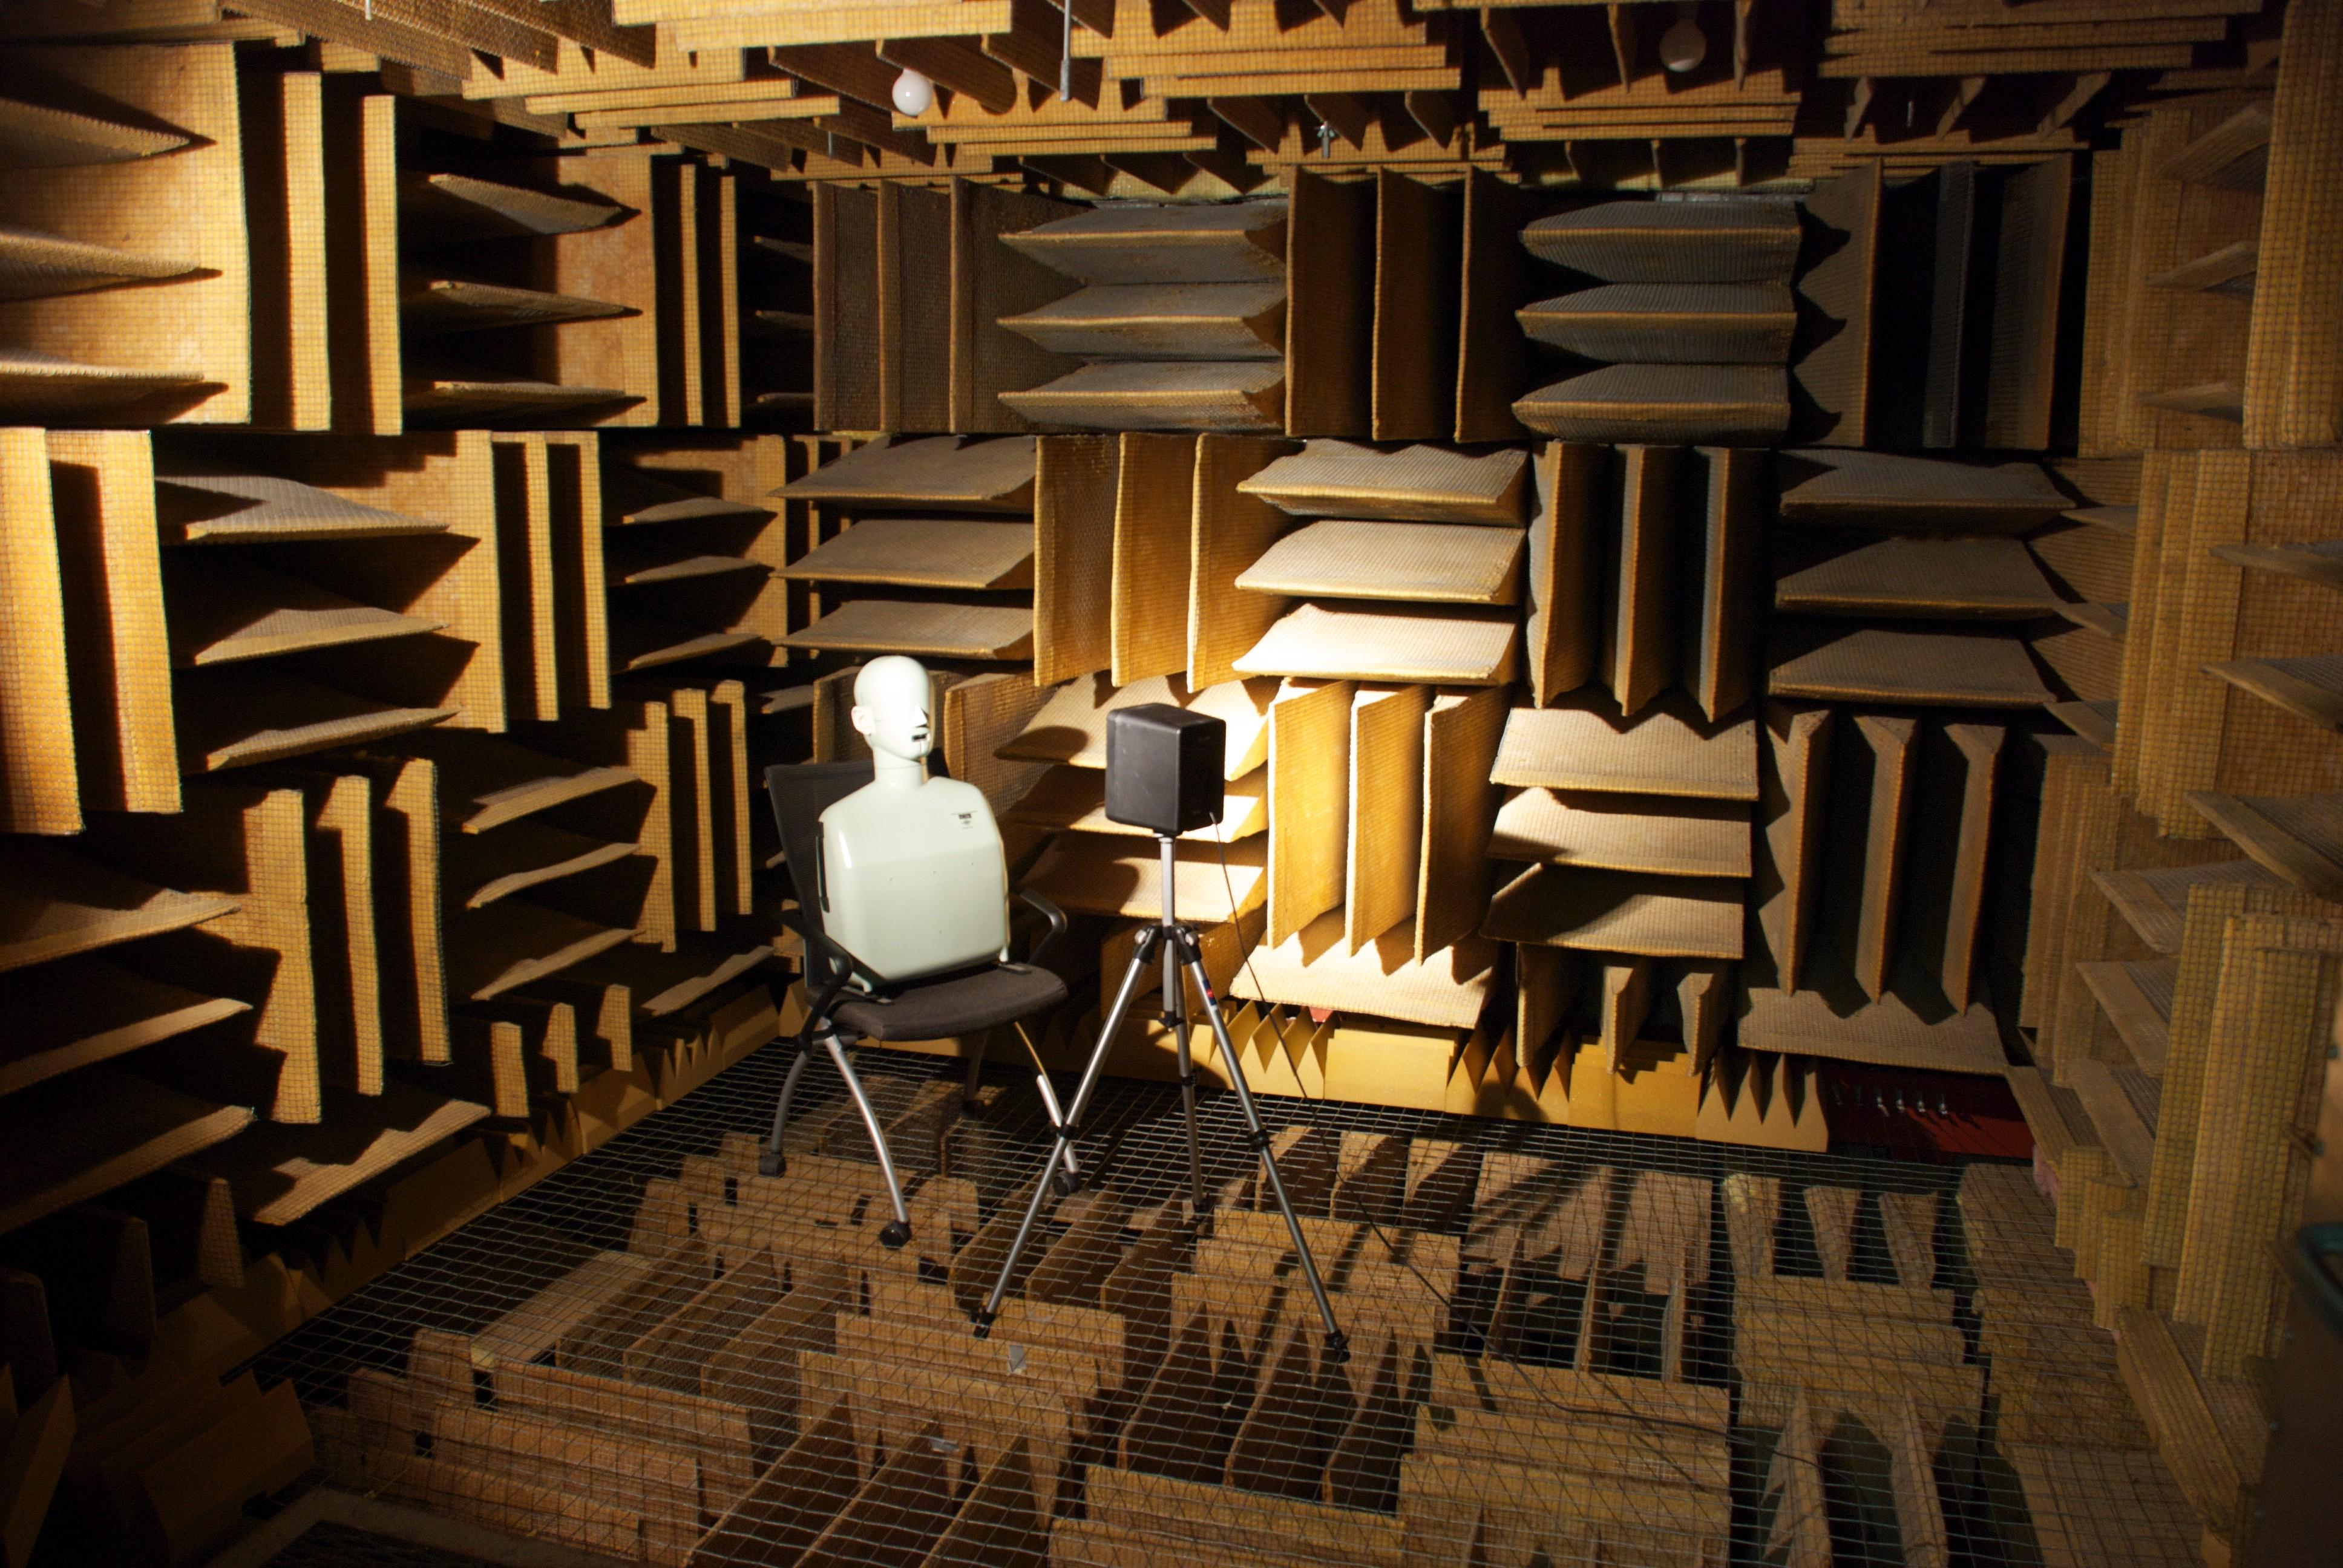 The world's quietest room - CNN Style